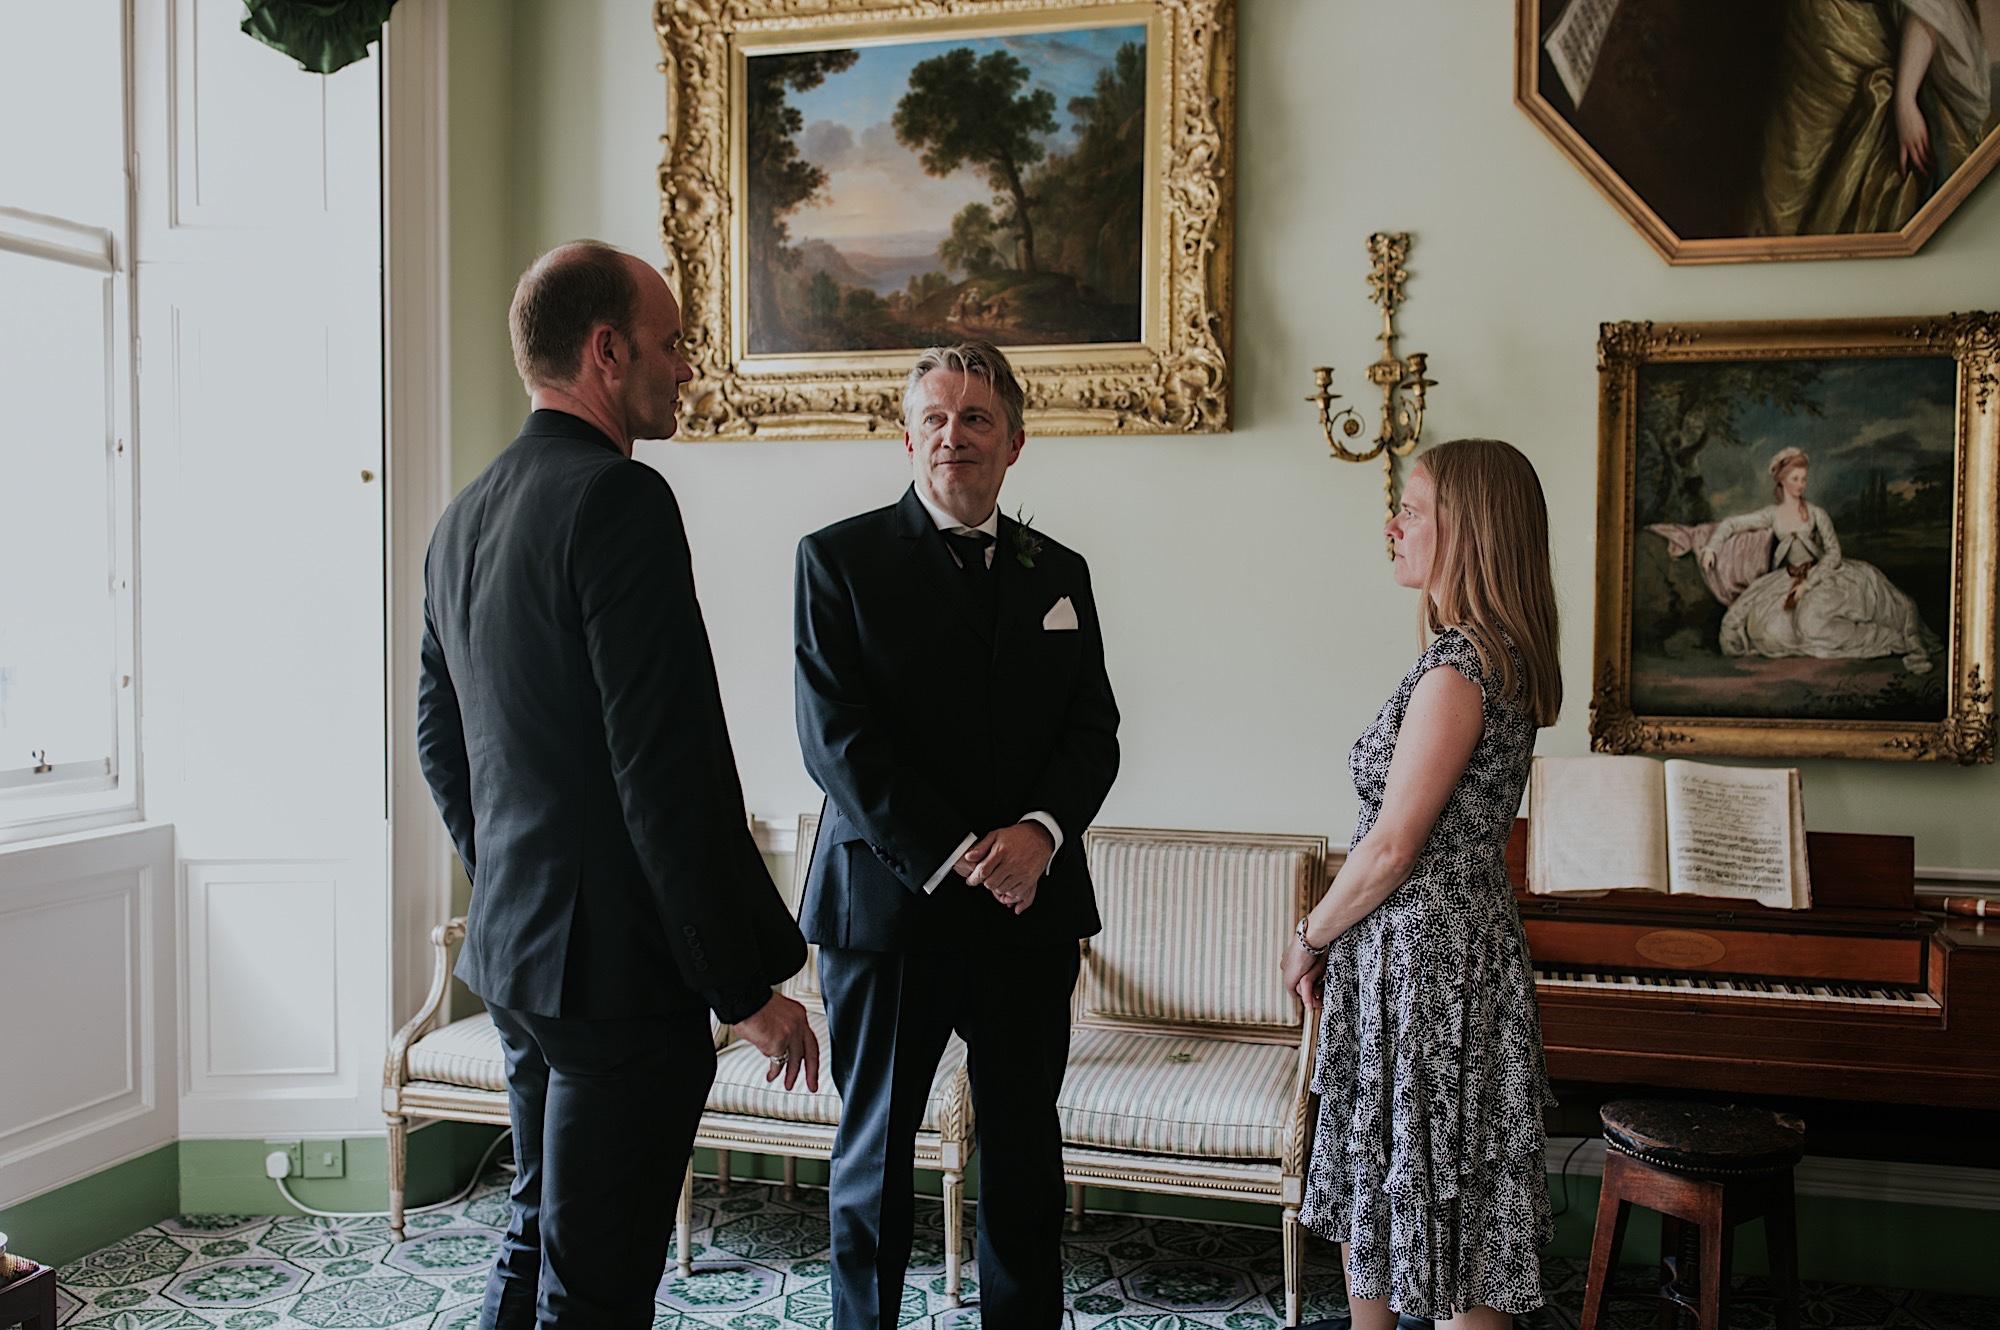 georgian house edinburgh elopement photographer